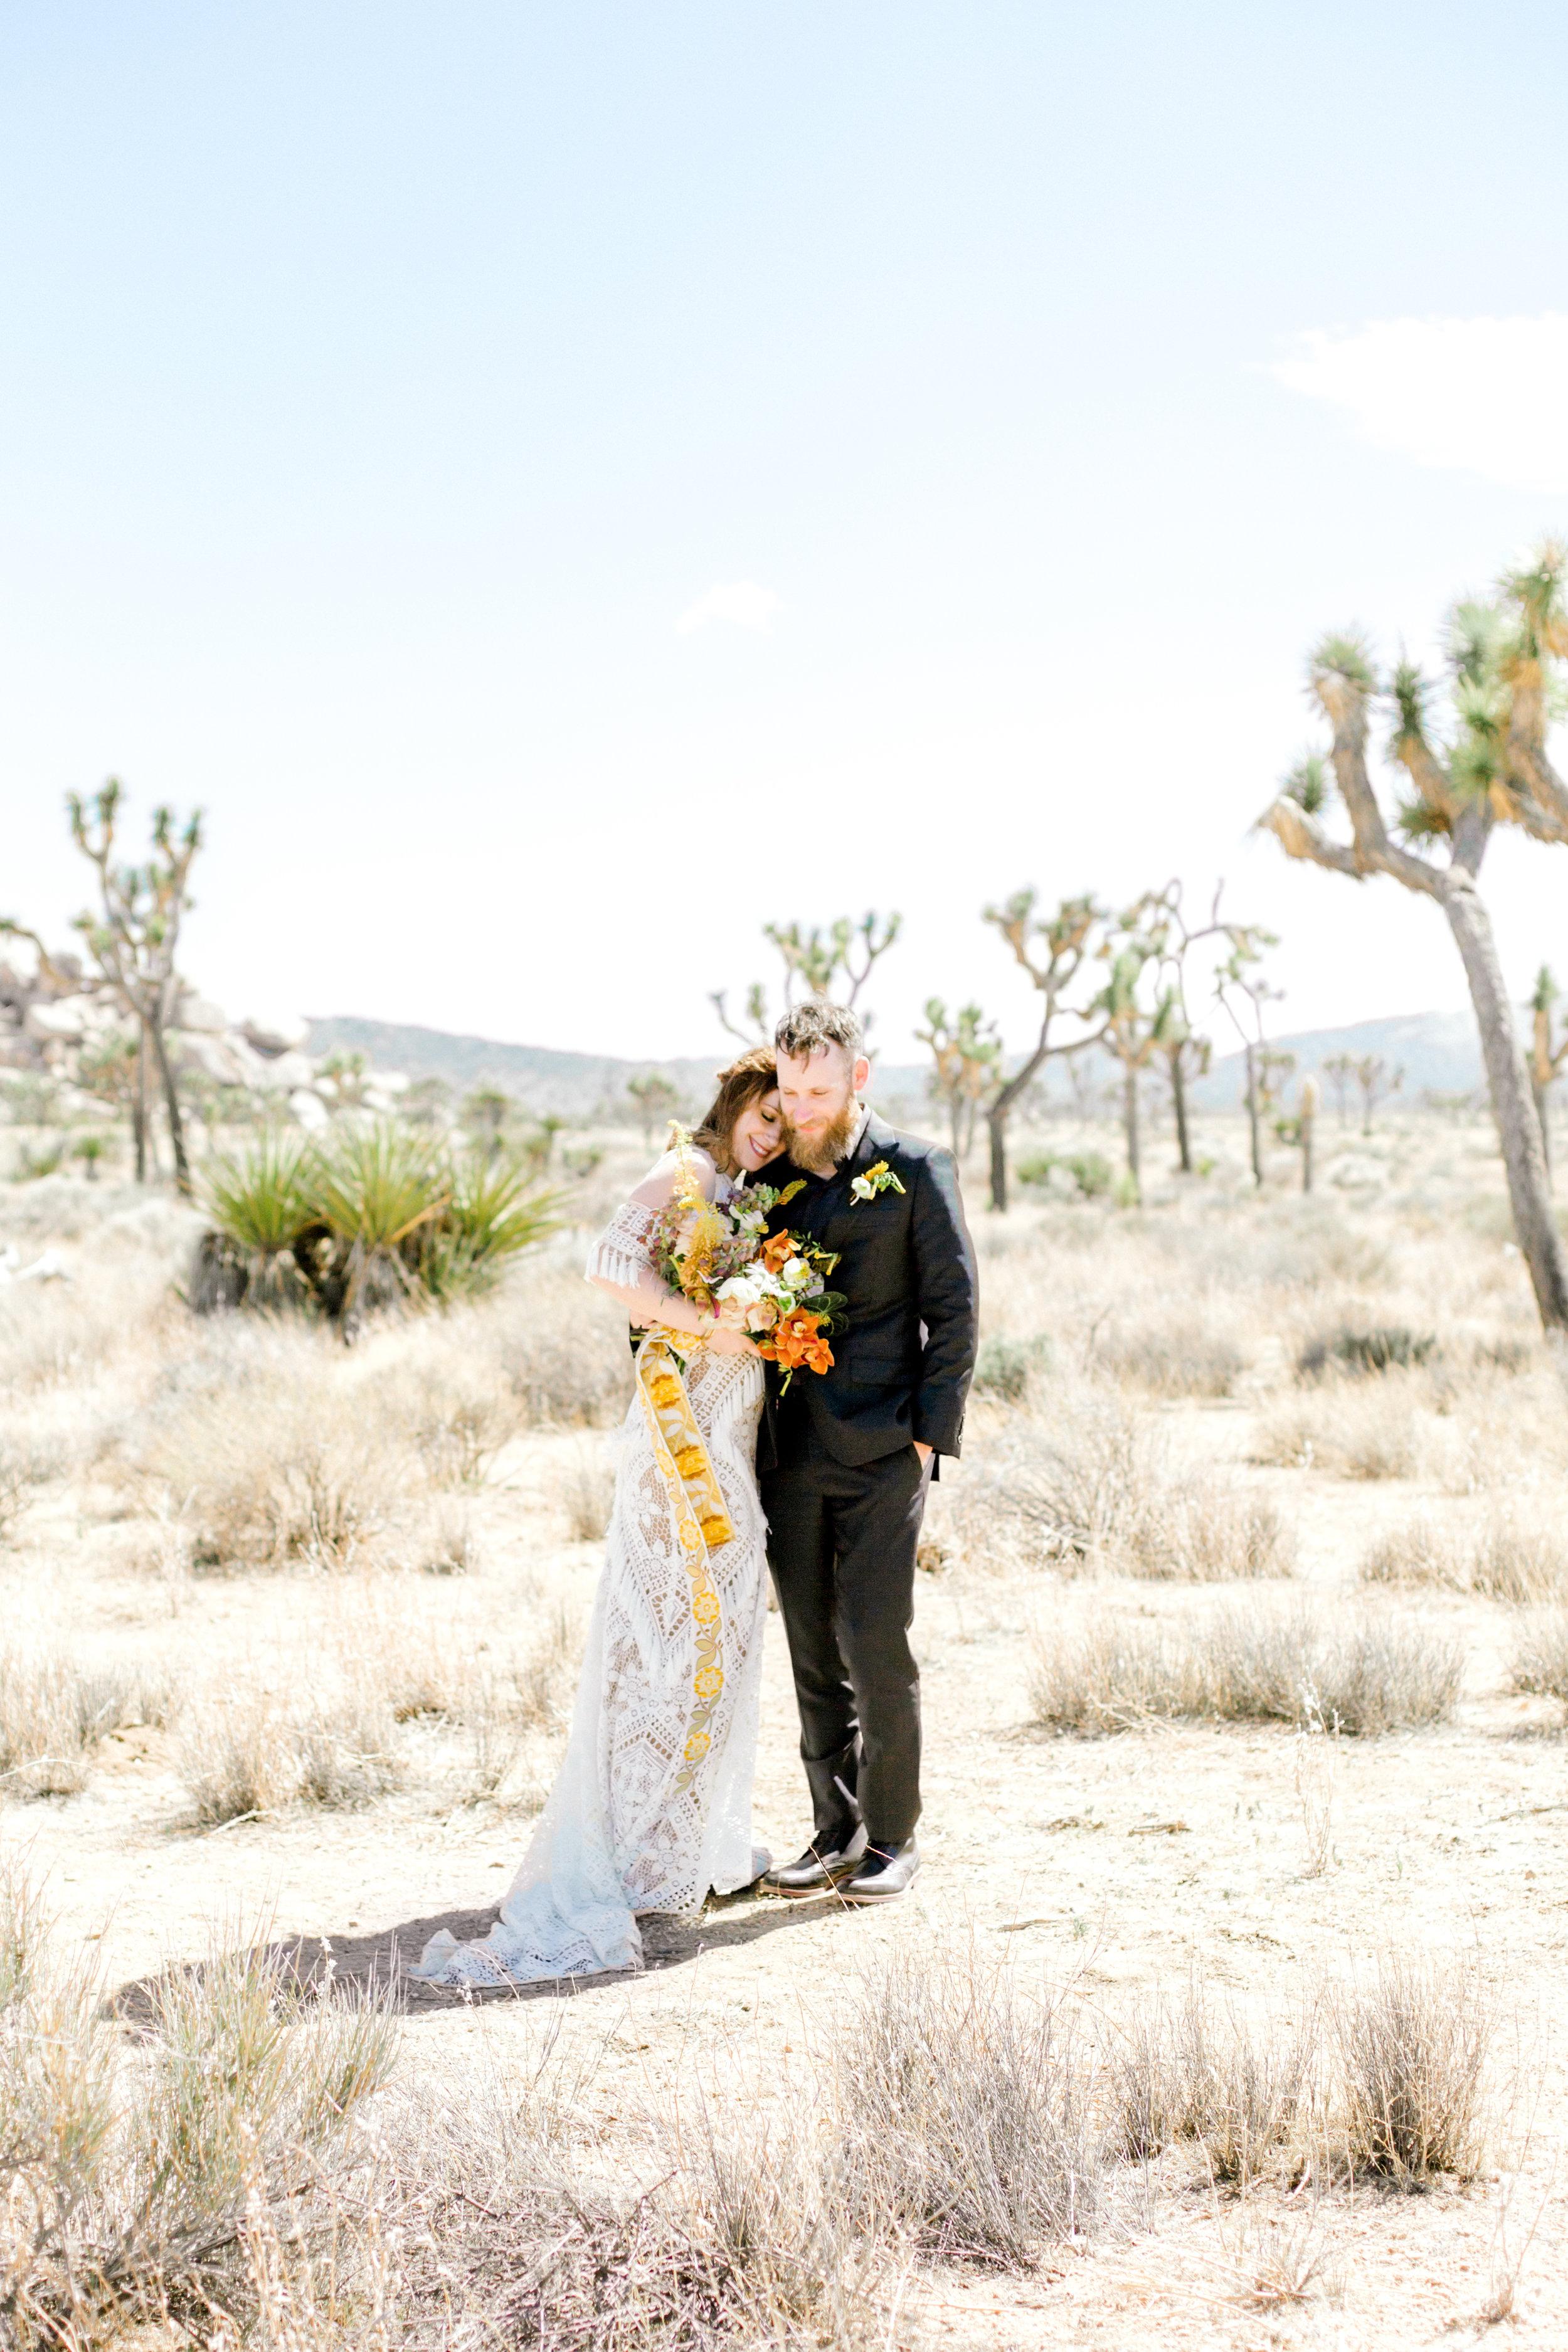 jessica sgubin photography atlanta portrait photographer engagement family couple wedding joshua tree wedding elopement-1.jpg